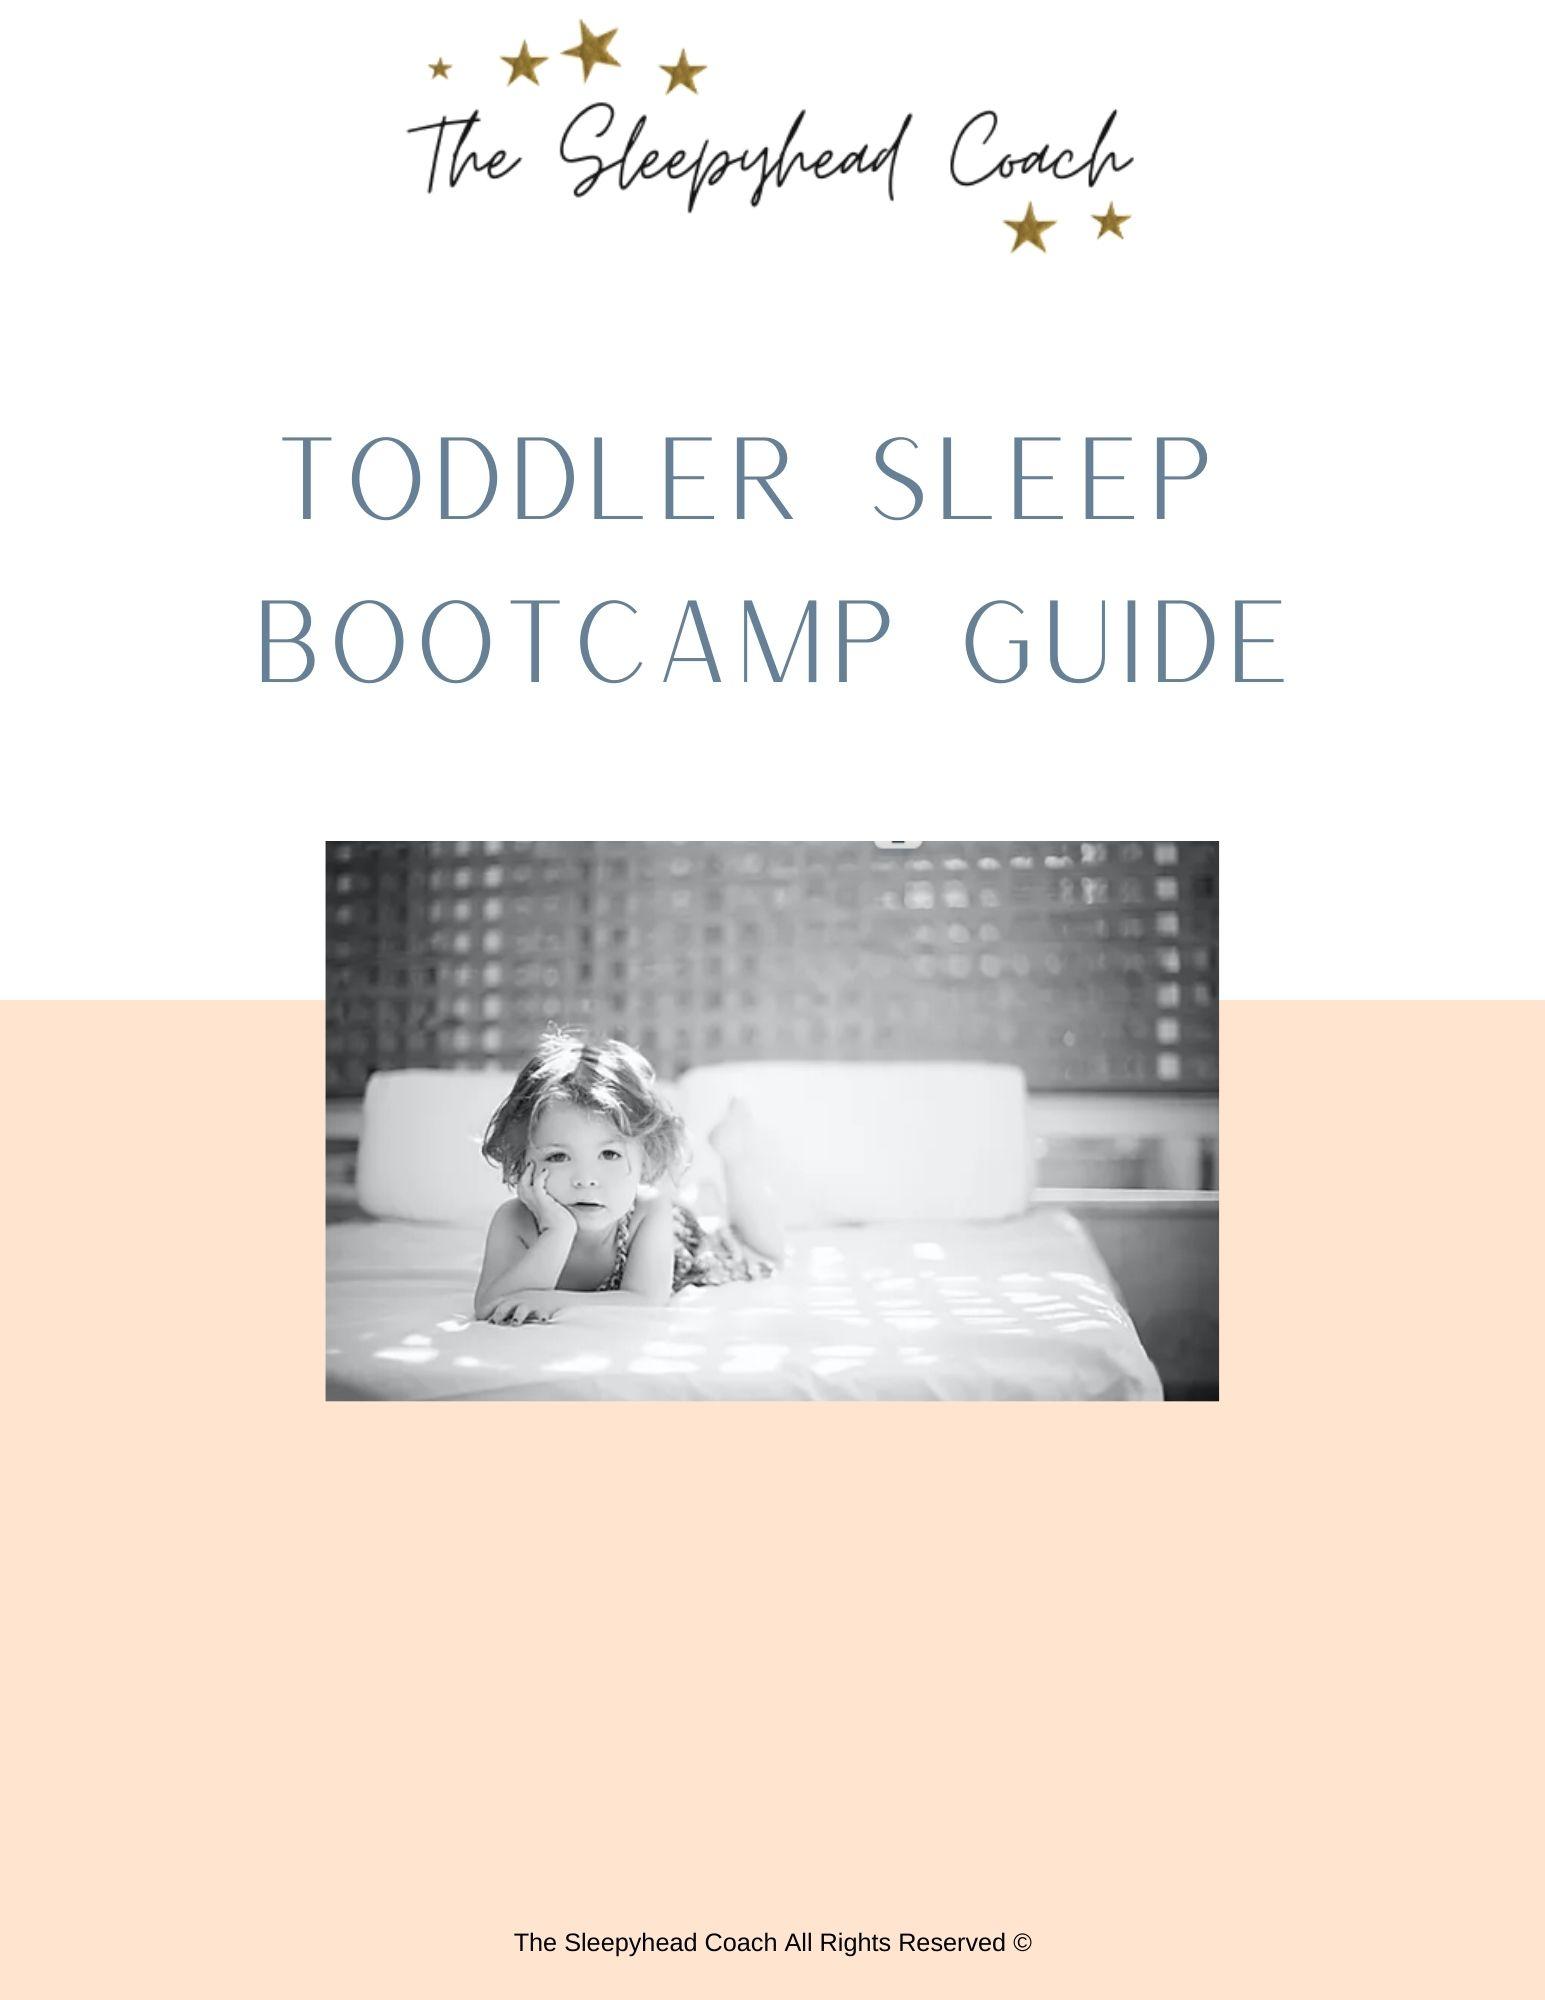 Toddler sleep guide